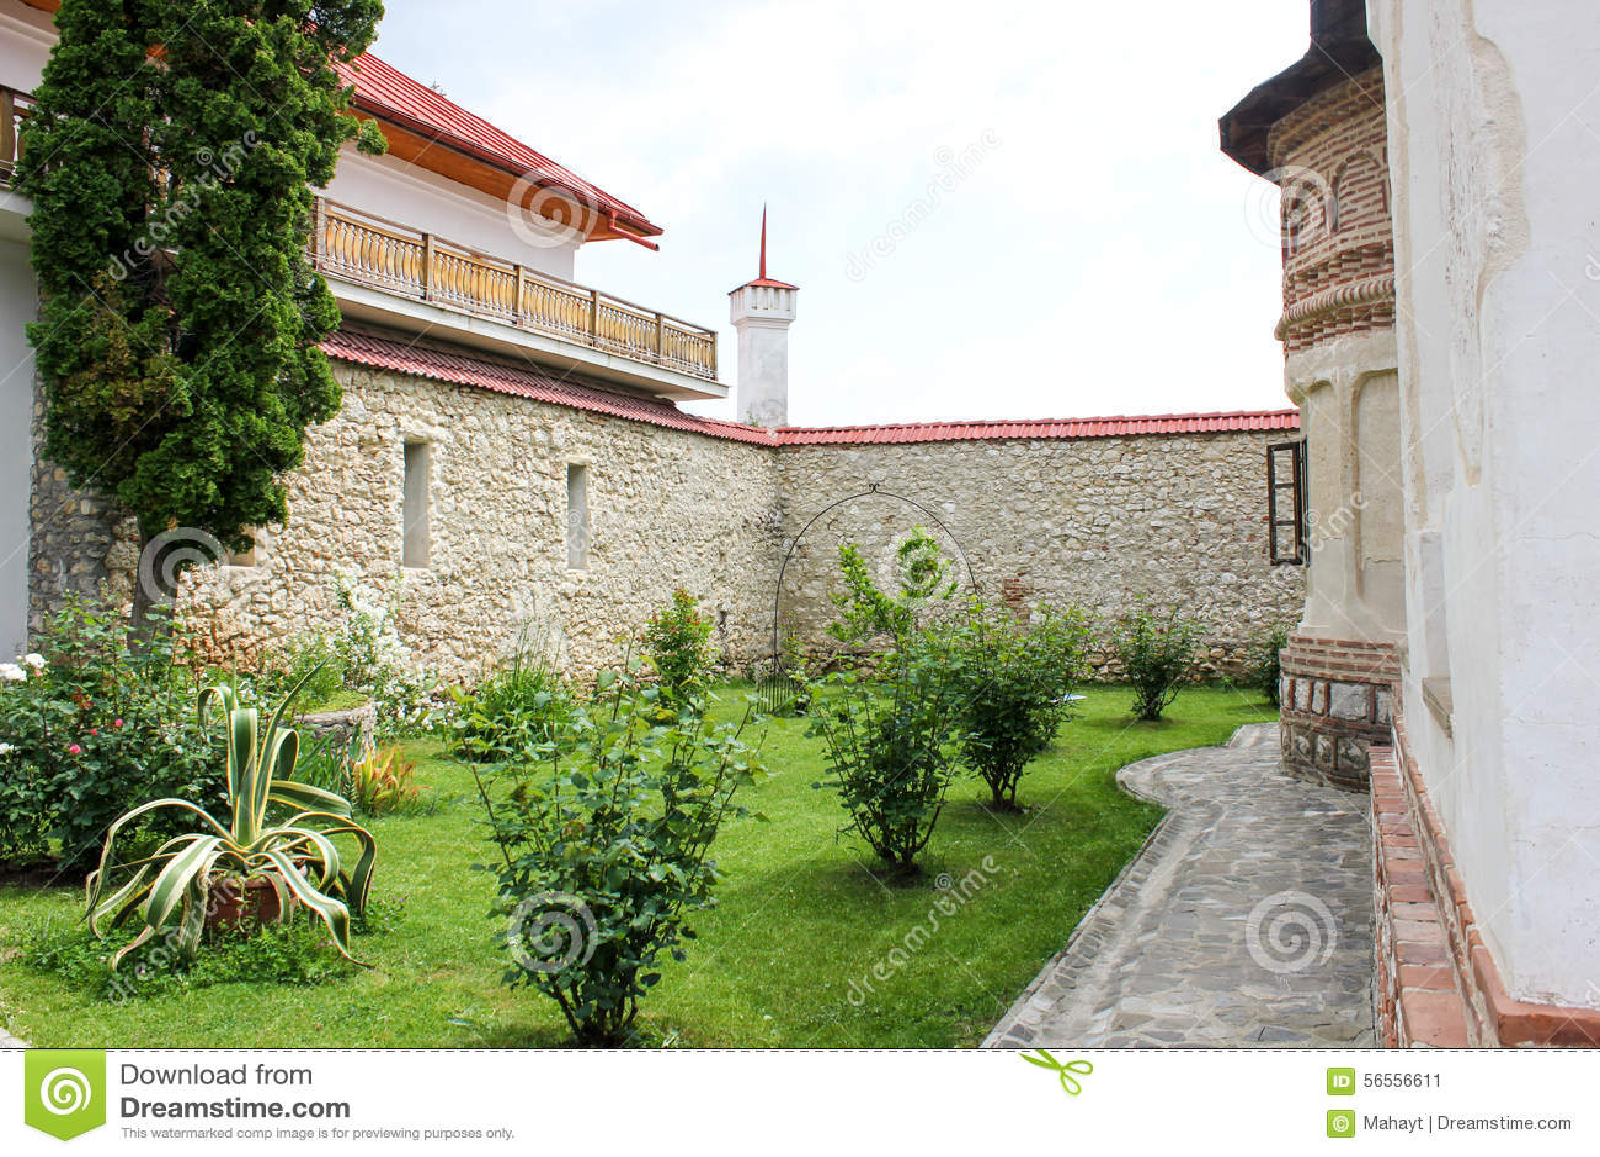 Download Αγροτικό τοπίο με το παλαιό μοναστήρι στη Ρουμανία Στοκ Εικόνα - εικόνα από χριστιανός, επαρχία: 56556611